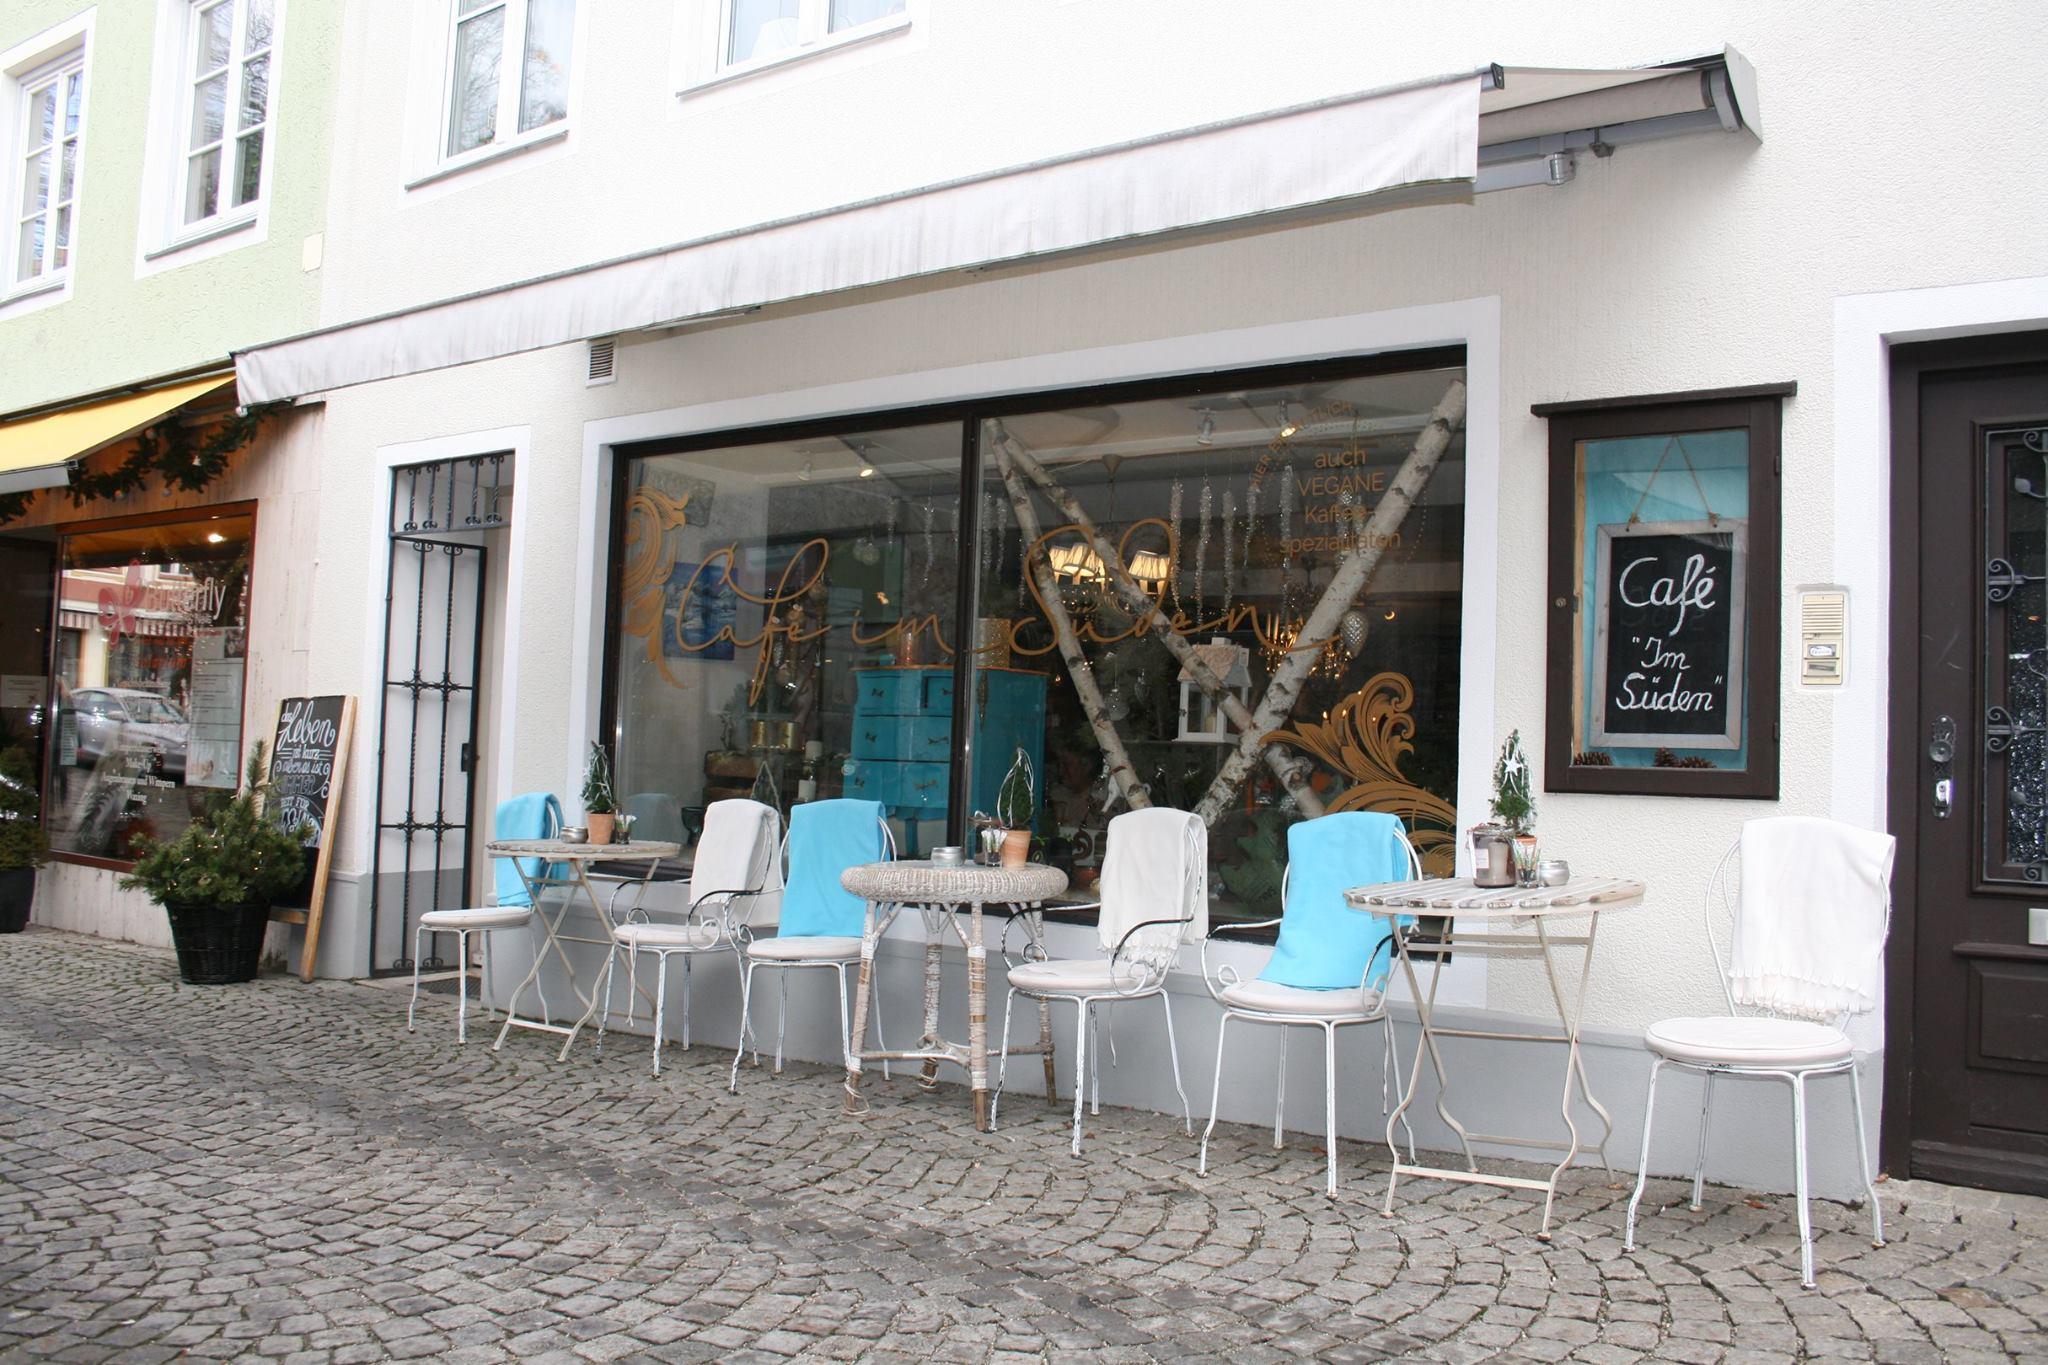 Cafe Im Suden Bad Tolz Vegan Kuchen Geback Pralinen Deko